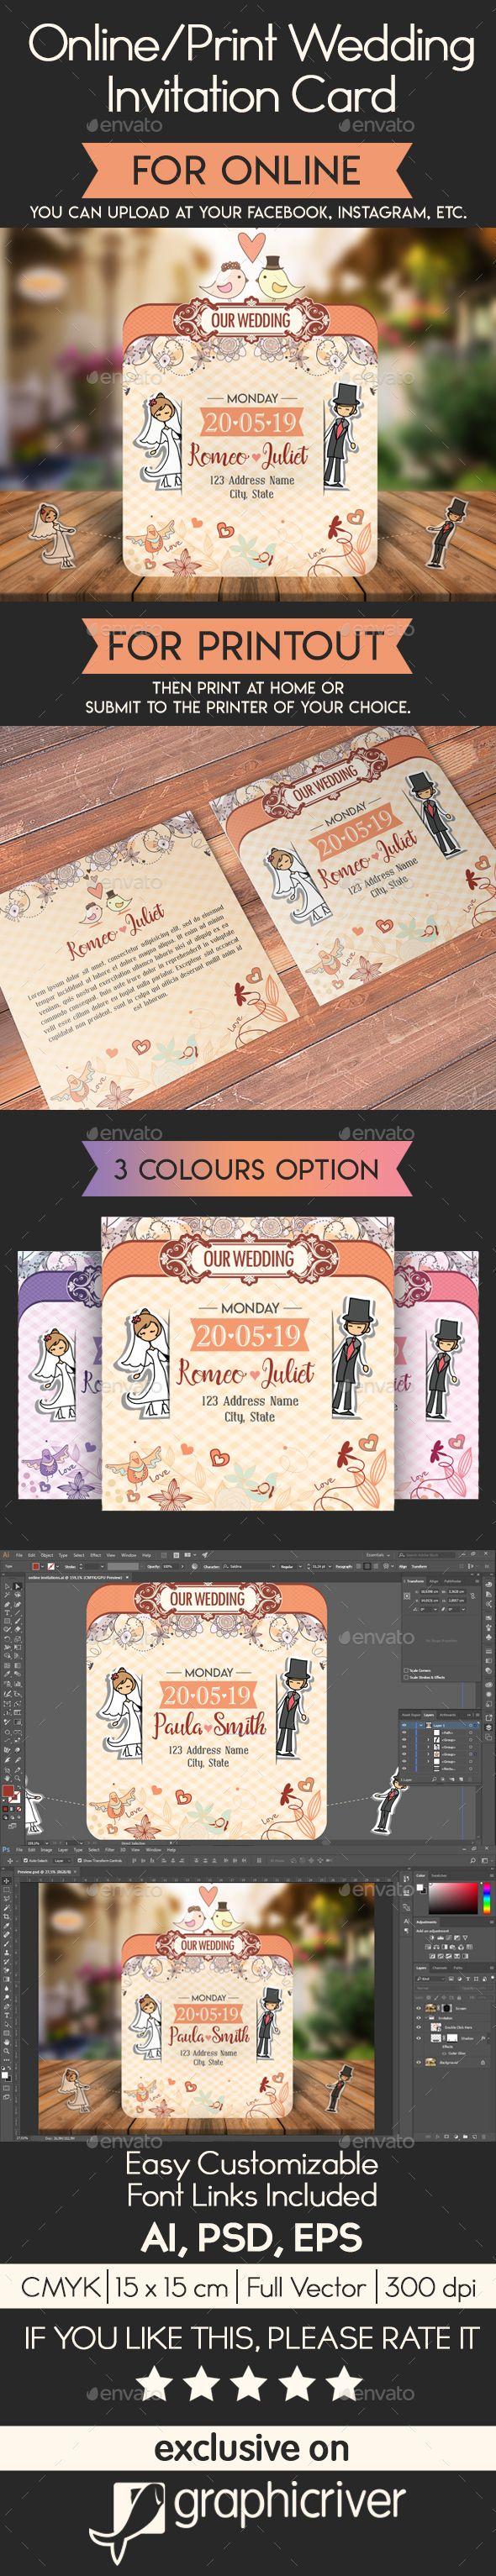 Online Print Wedding Invitation Card The